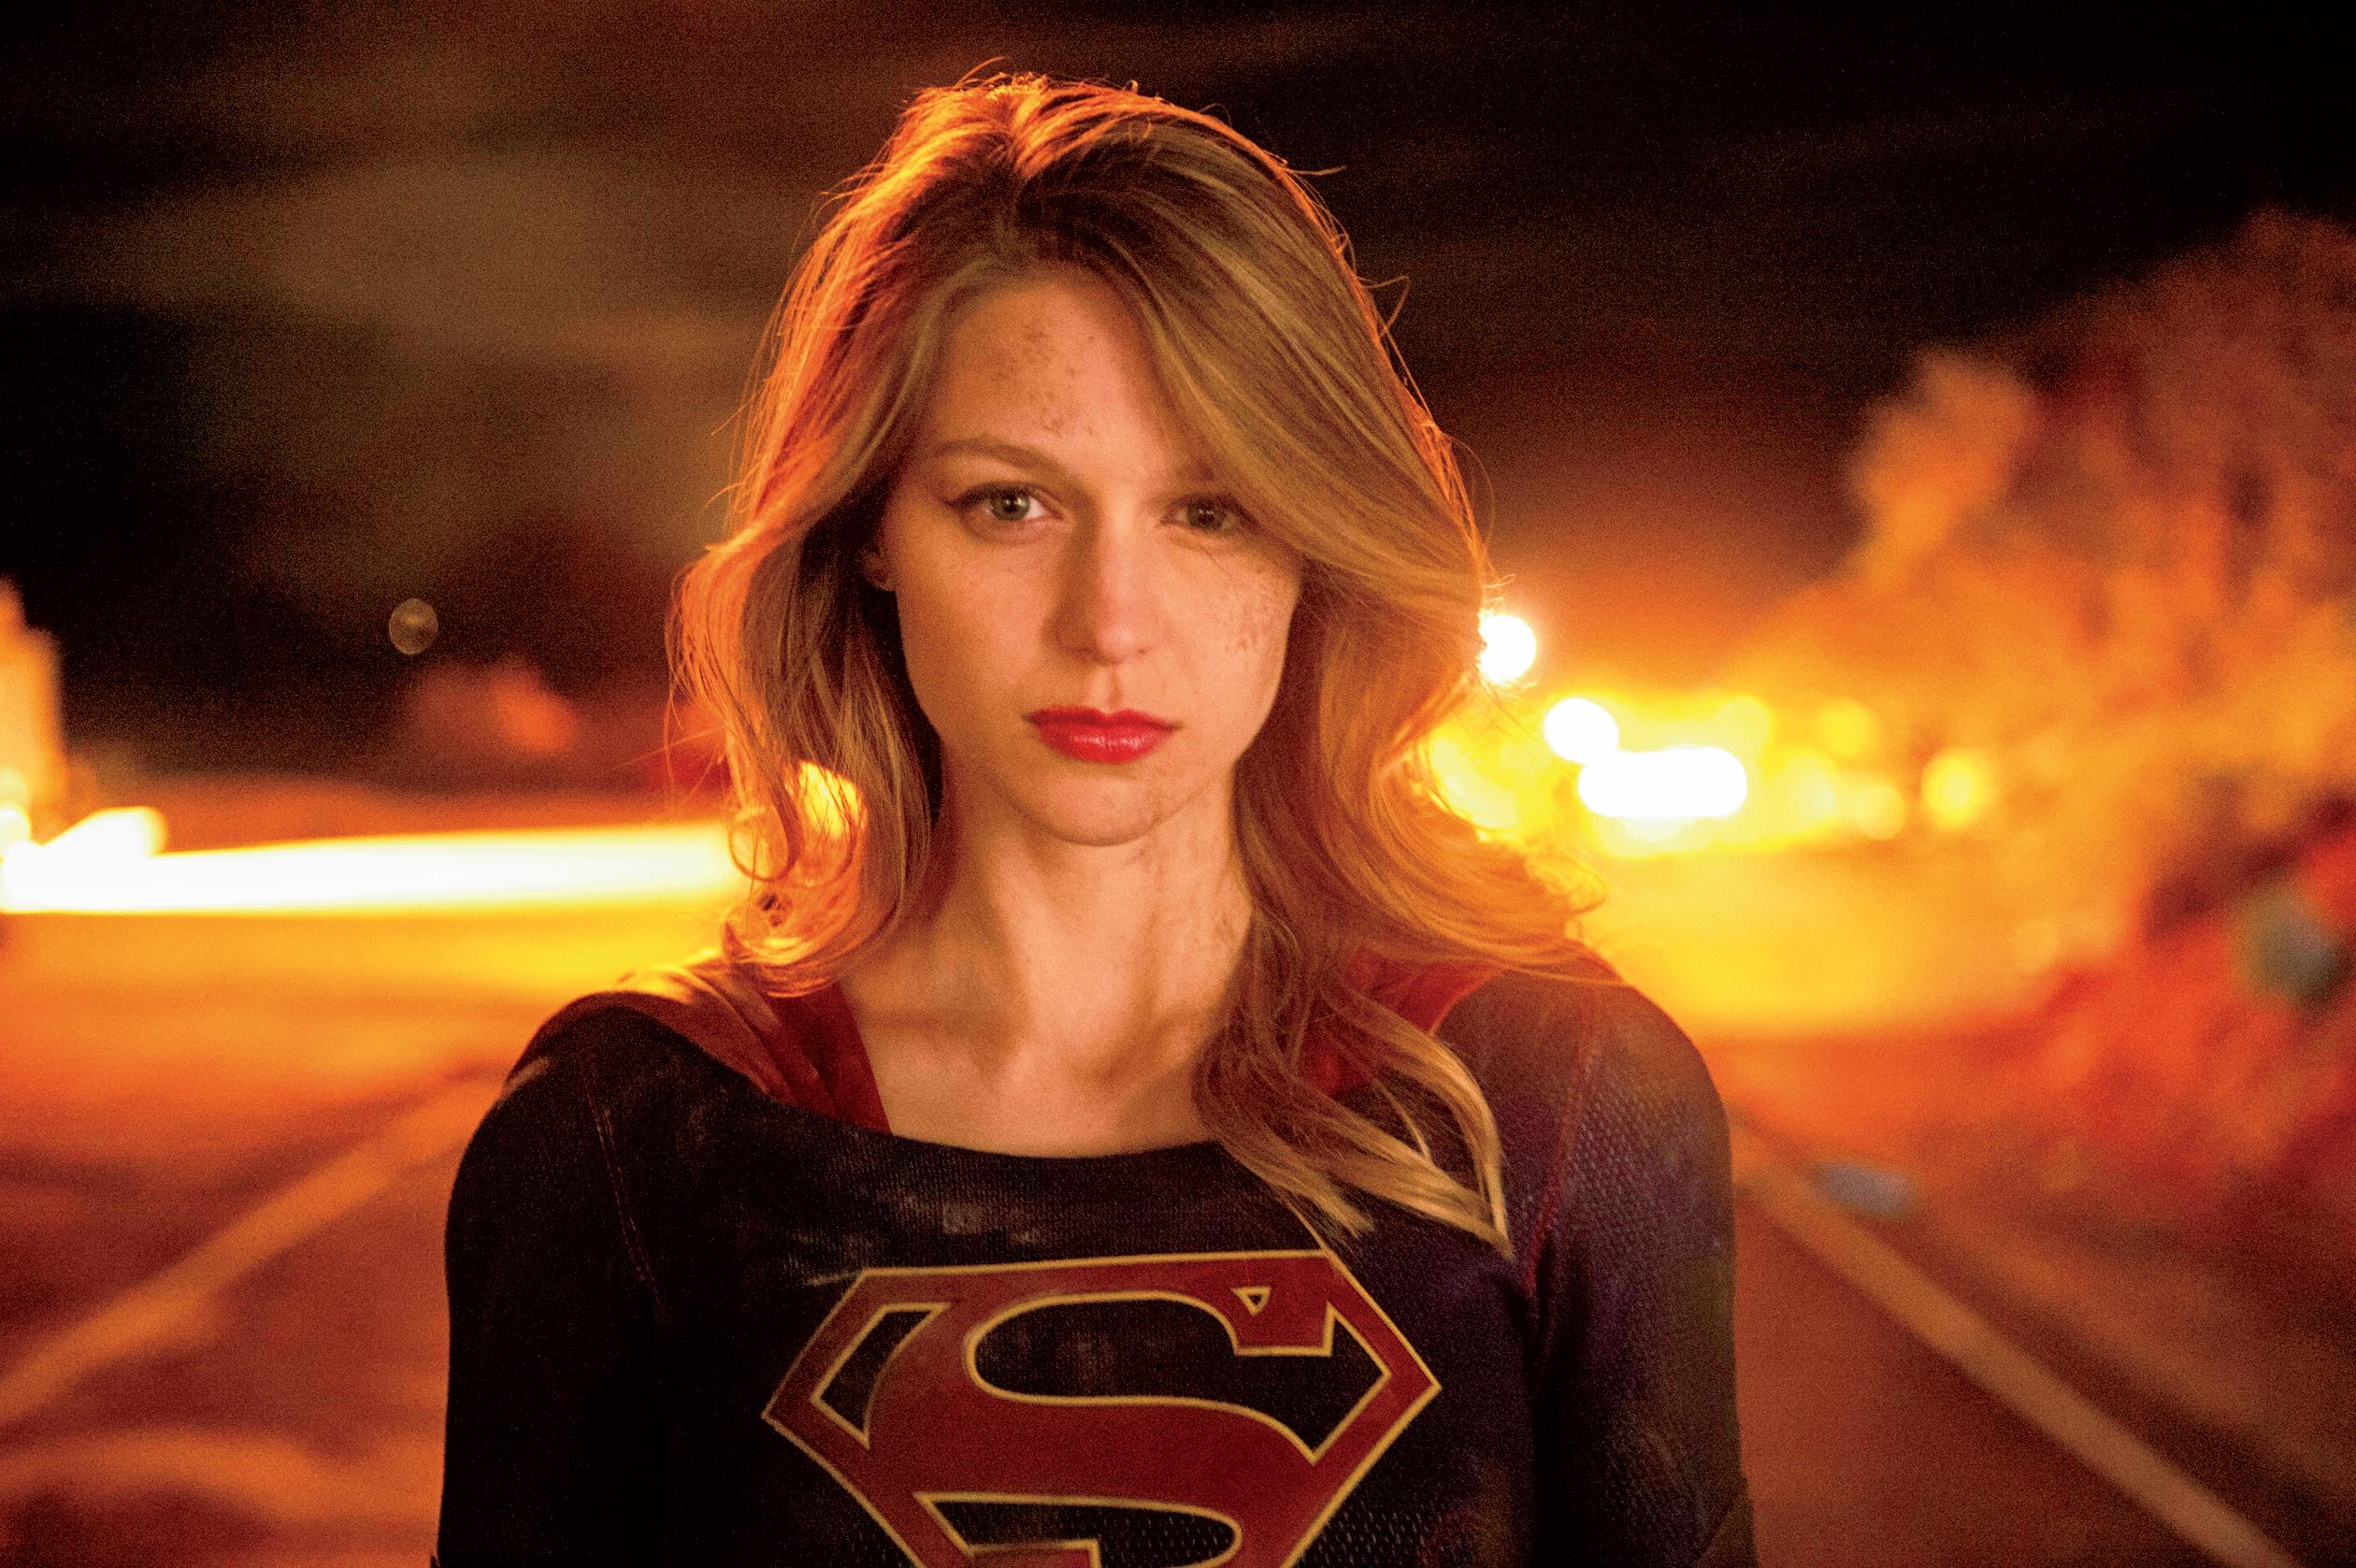 Smoking Girl Full Hd Wallpaper Fotos De Supergirl Imagenes De La Serie De Supergirl Gratis